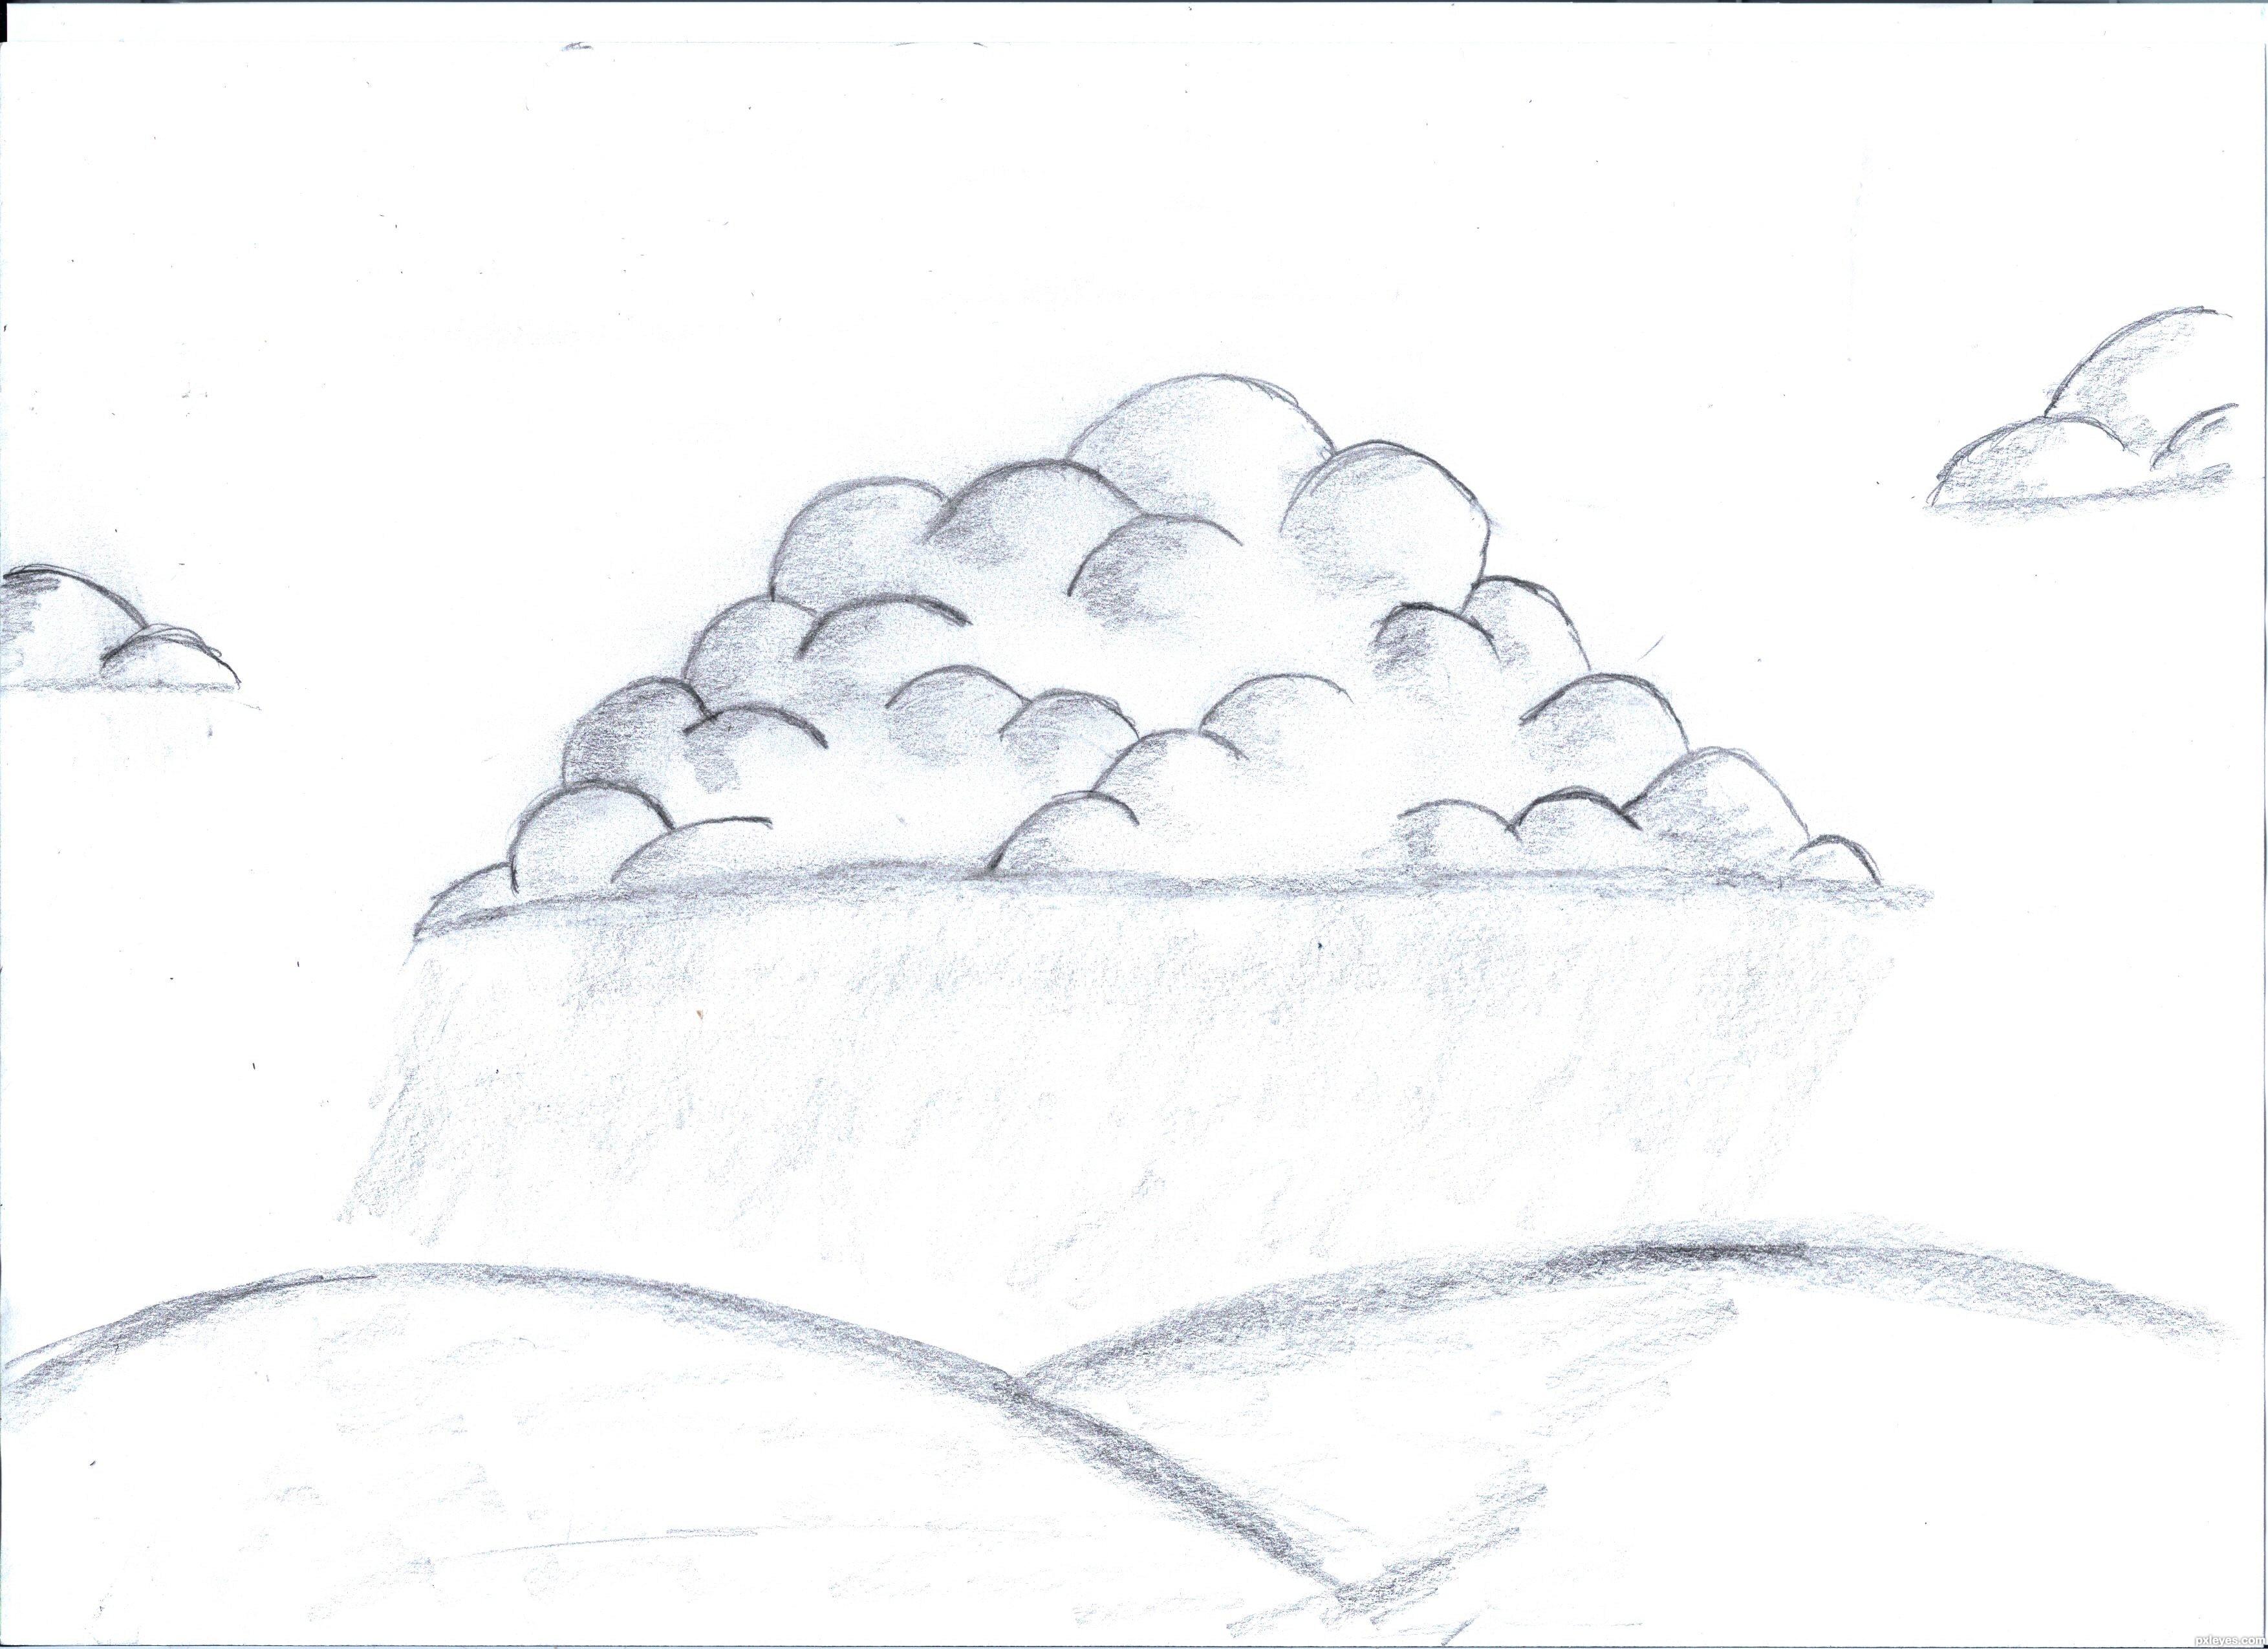 Drawn clouds rain drawing Com created Shapes itgik Day